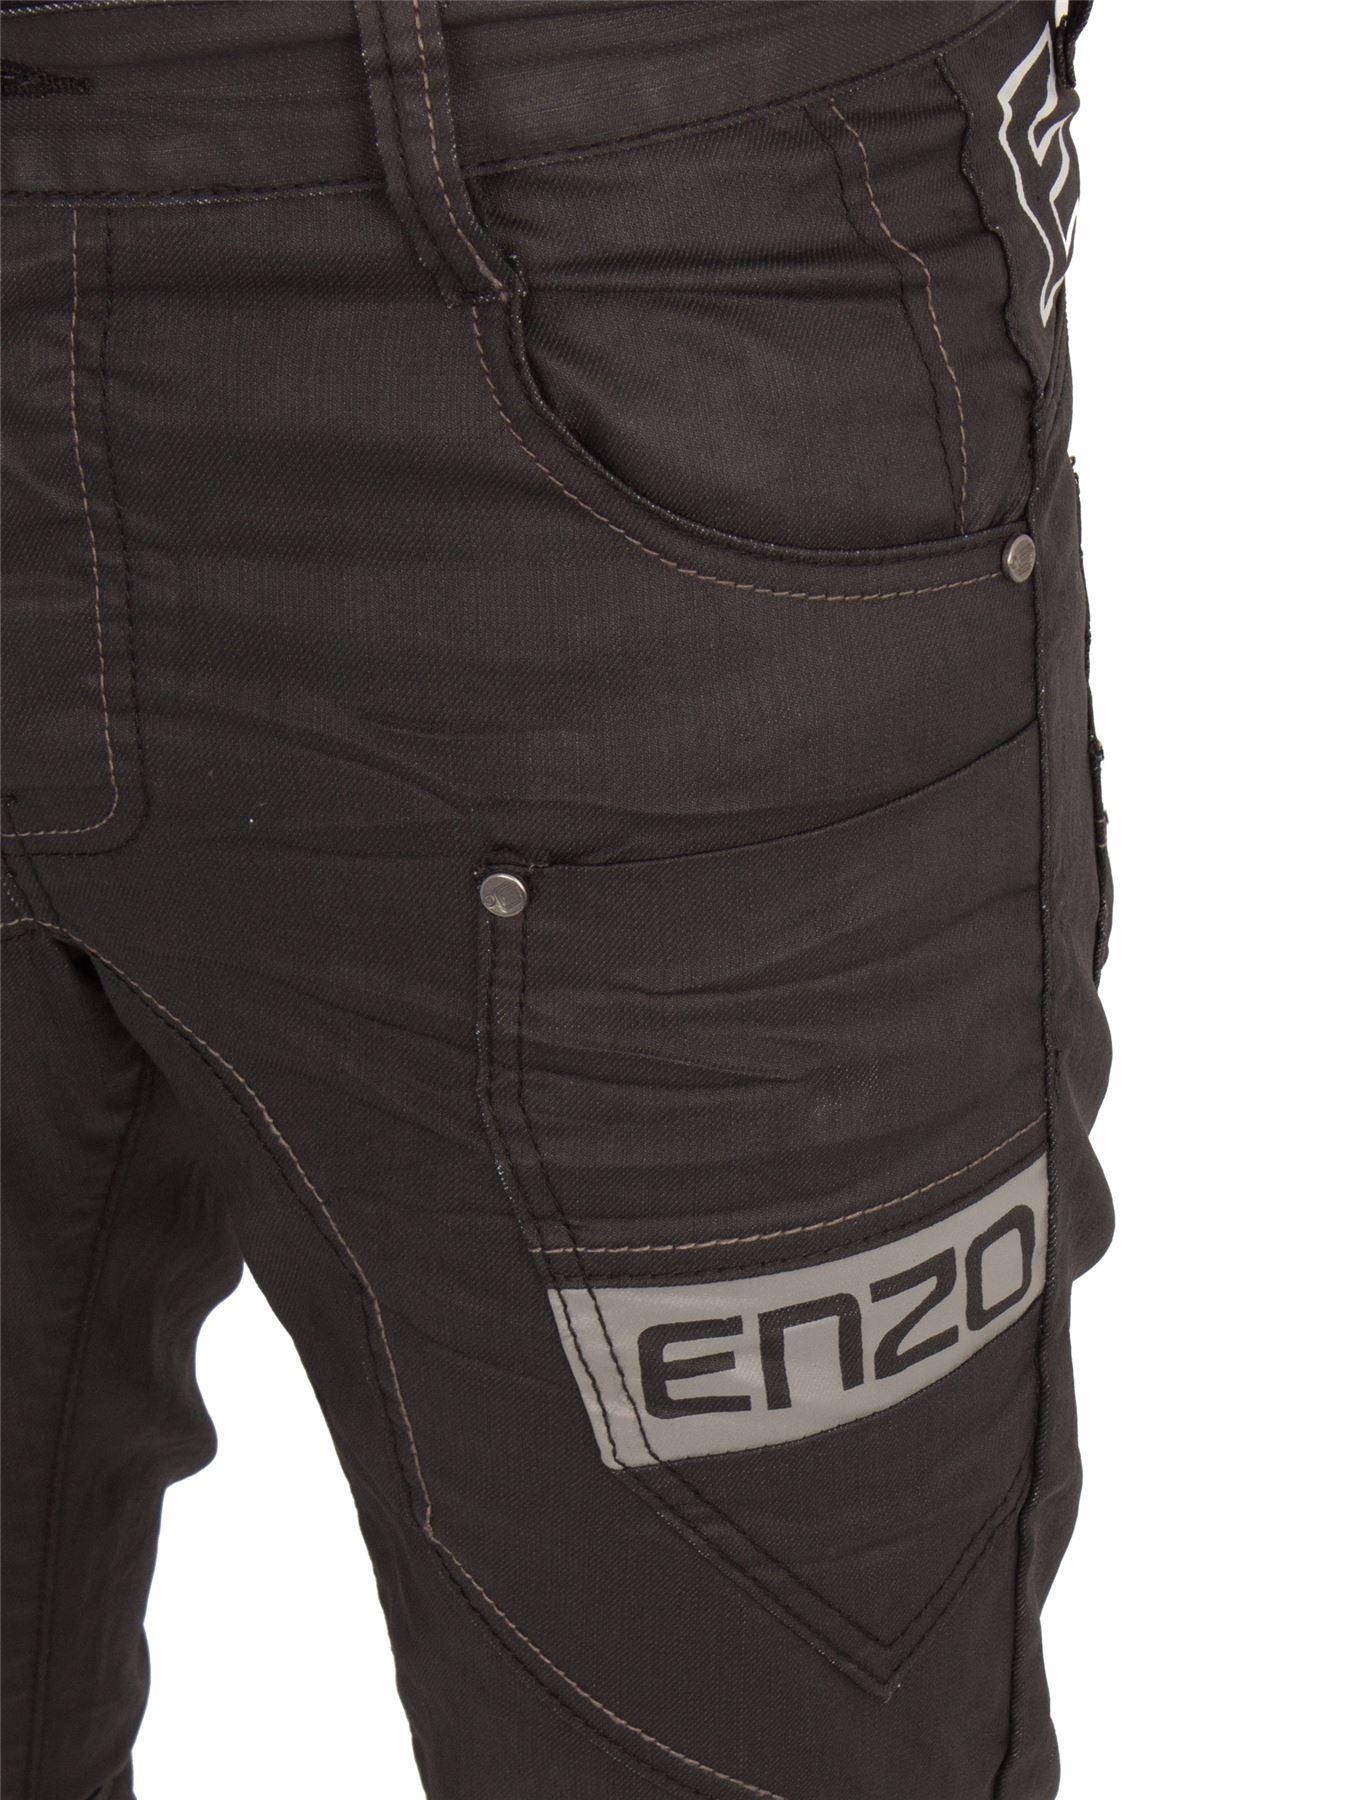 ENZO Pantaloni Cargo Combat da uomo Jeans pantaloni da lavoro in Denim Casual BIG TALL Tutti Girovita